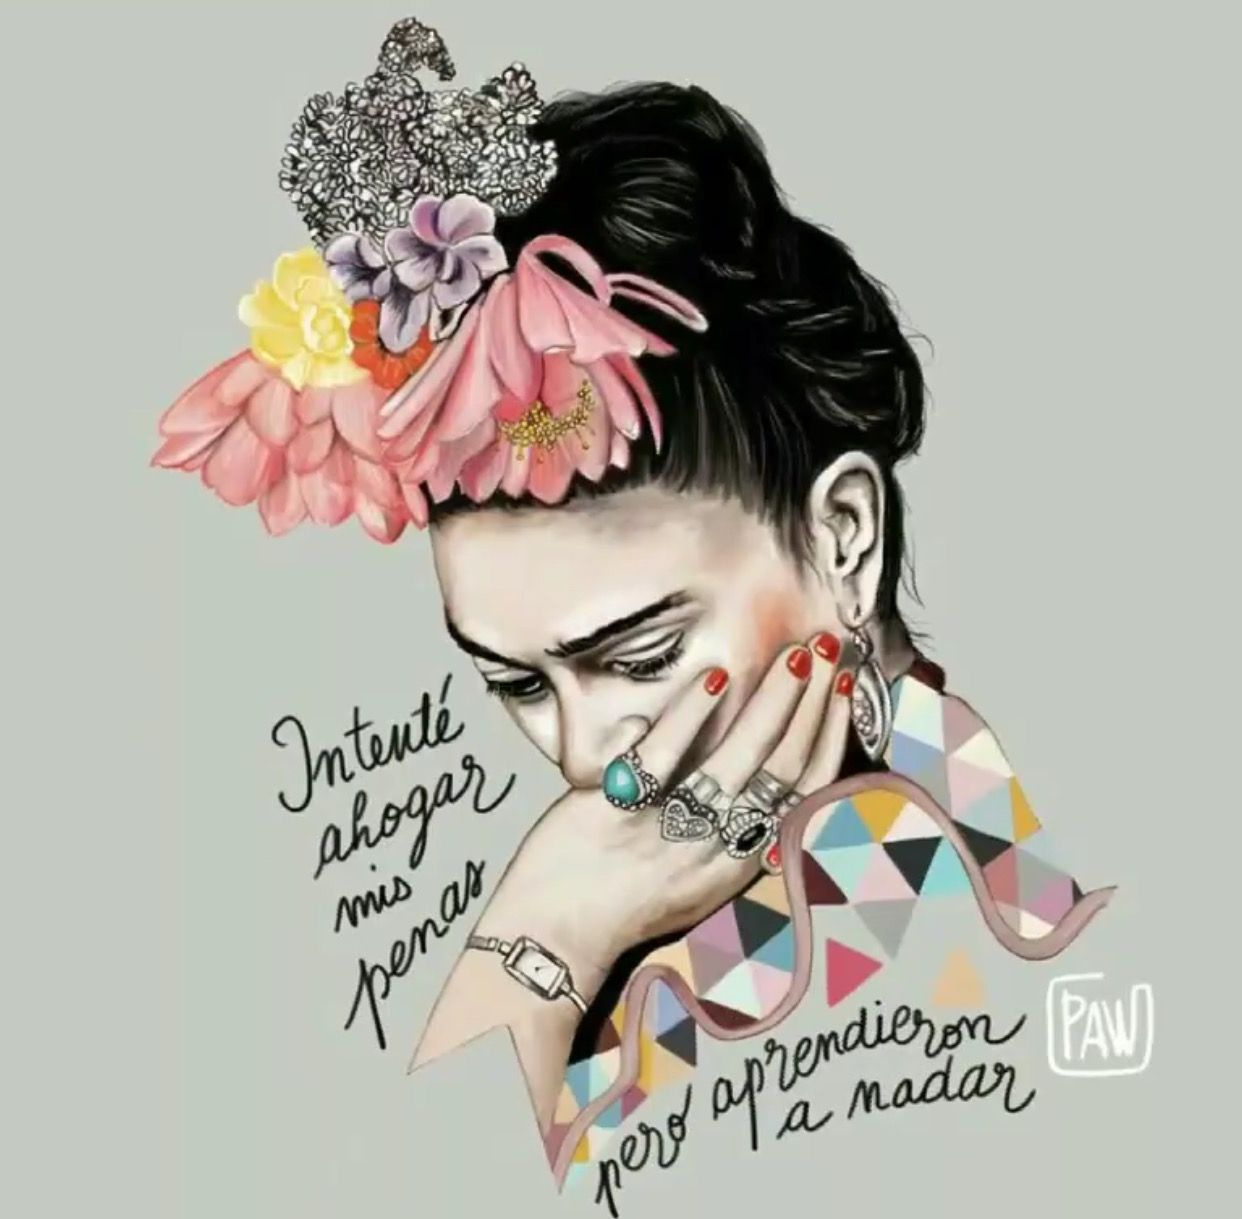 Pin de Sandra Pezo en Frida | Pinterest | Frida, Frida kahlo y Frida ...